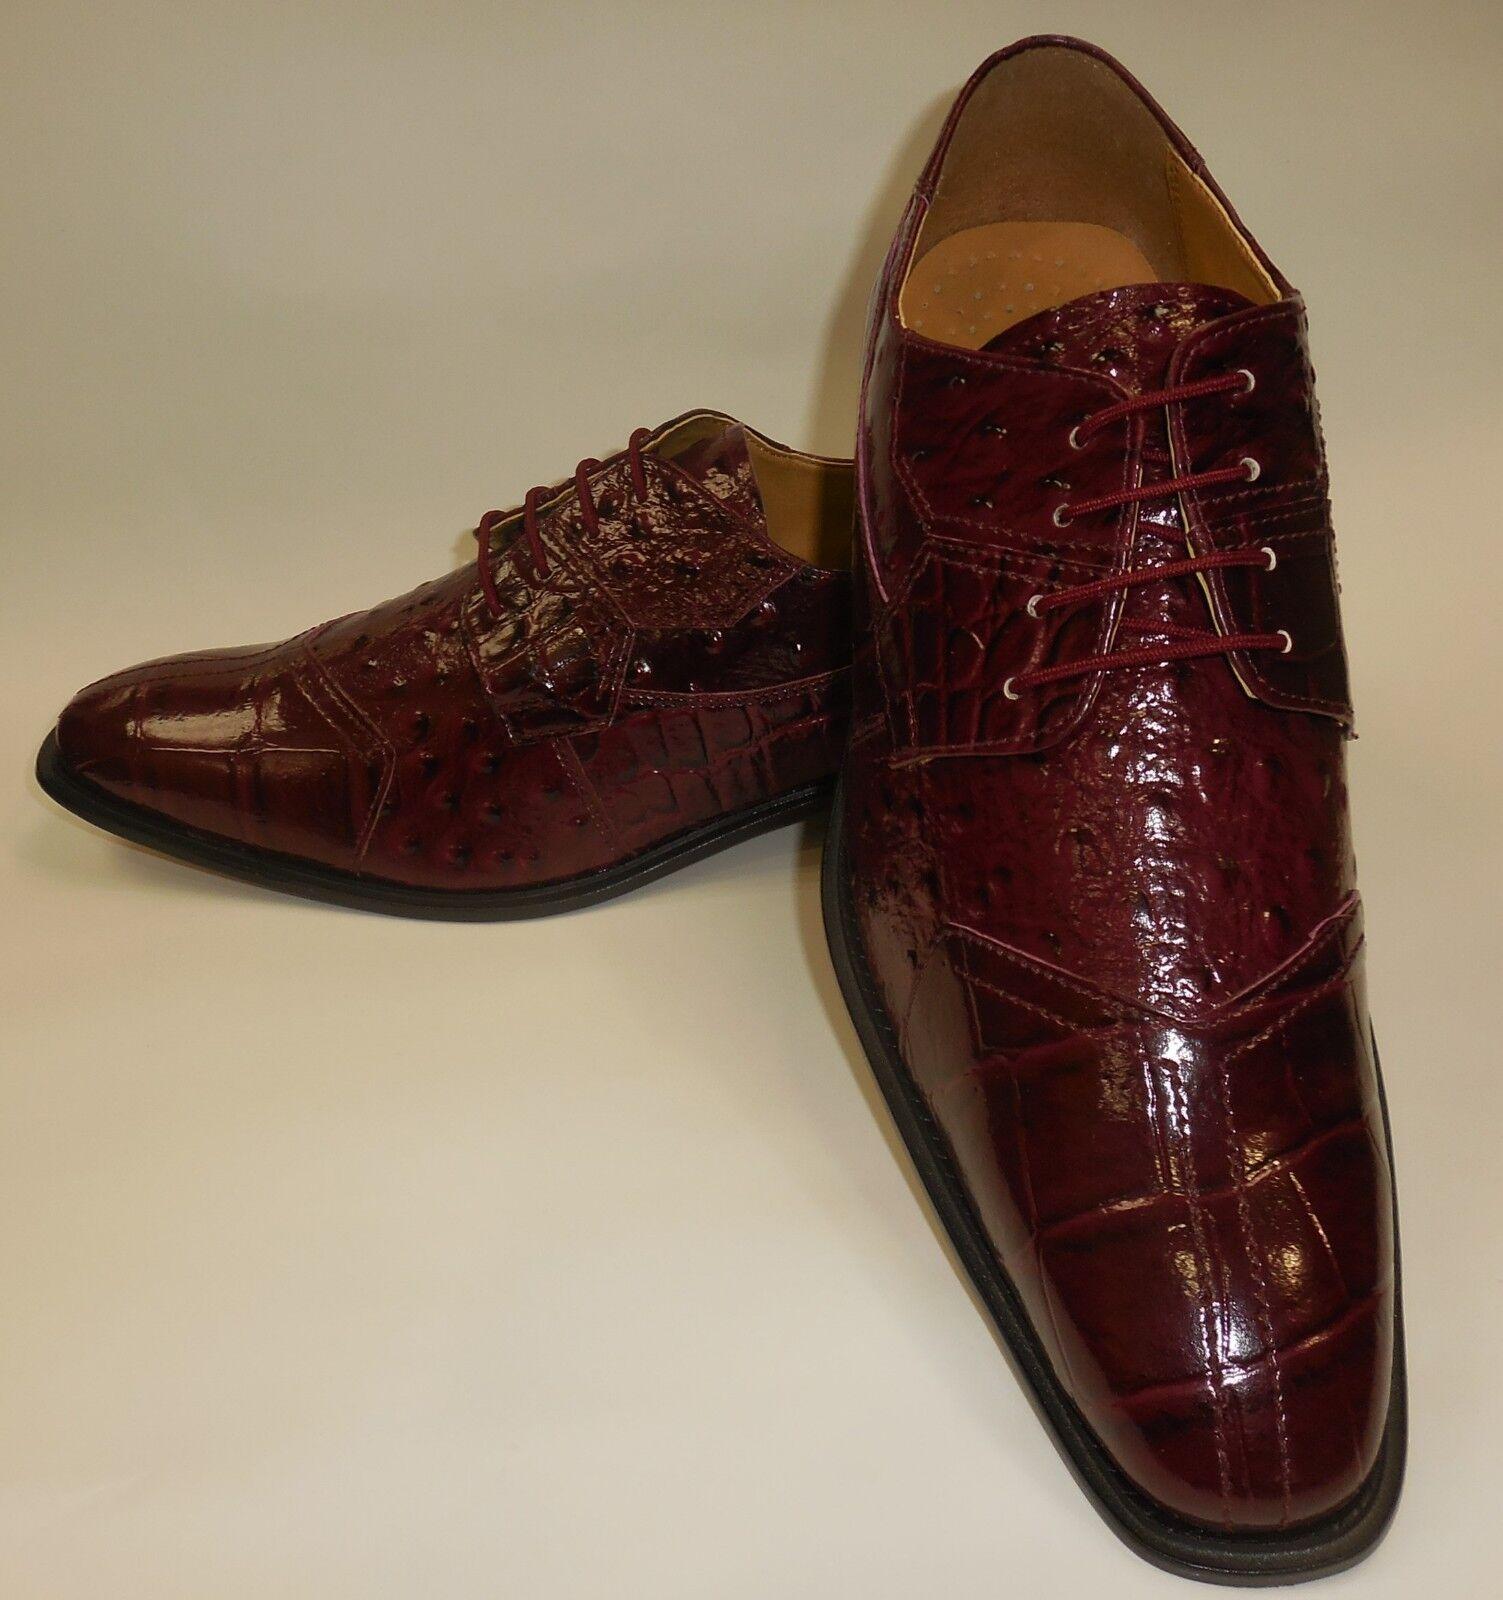 Mens Elegant Burgundy Croco-Look Croco-Look Croco-Look Dress Oxford schuhe Liberty LS1105 e71801